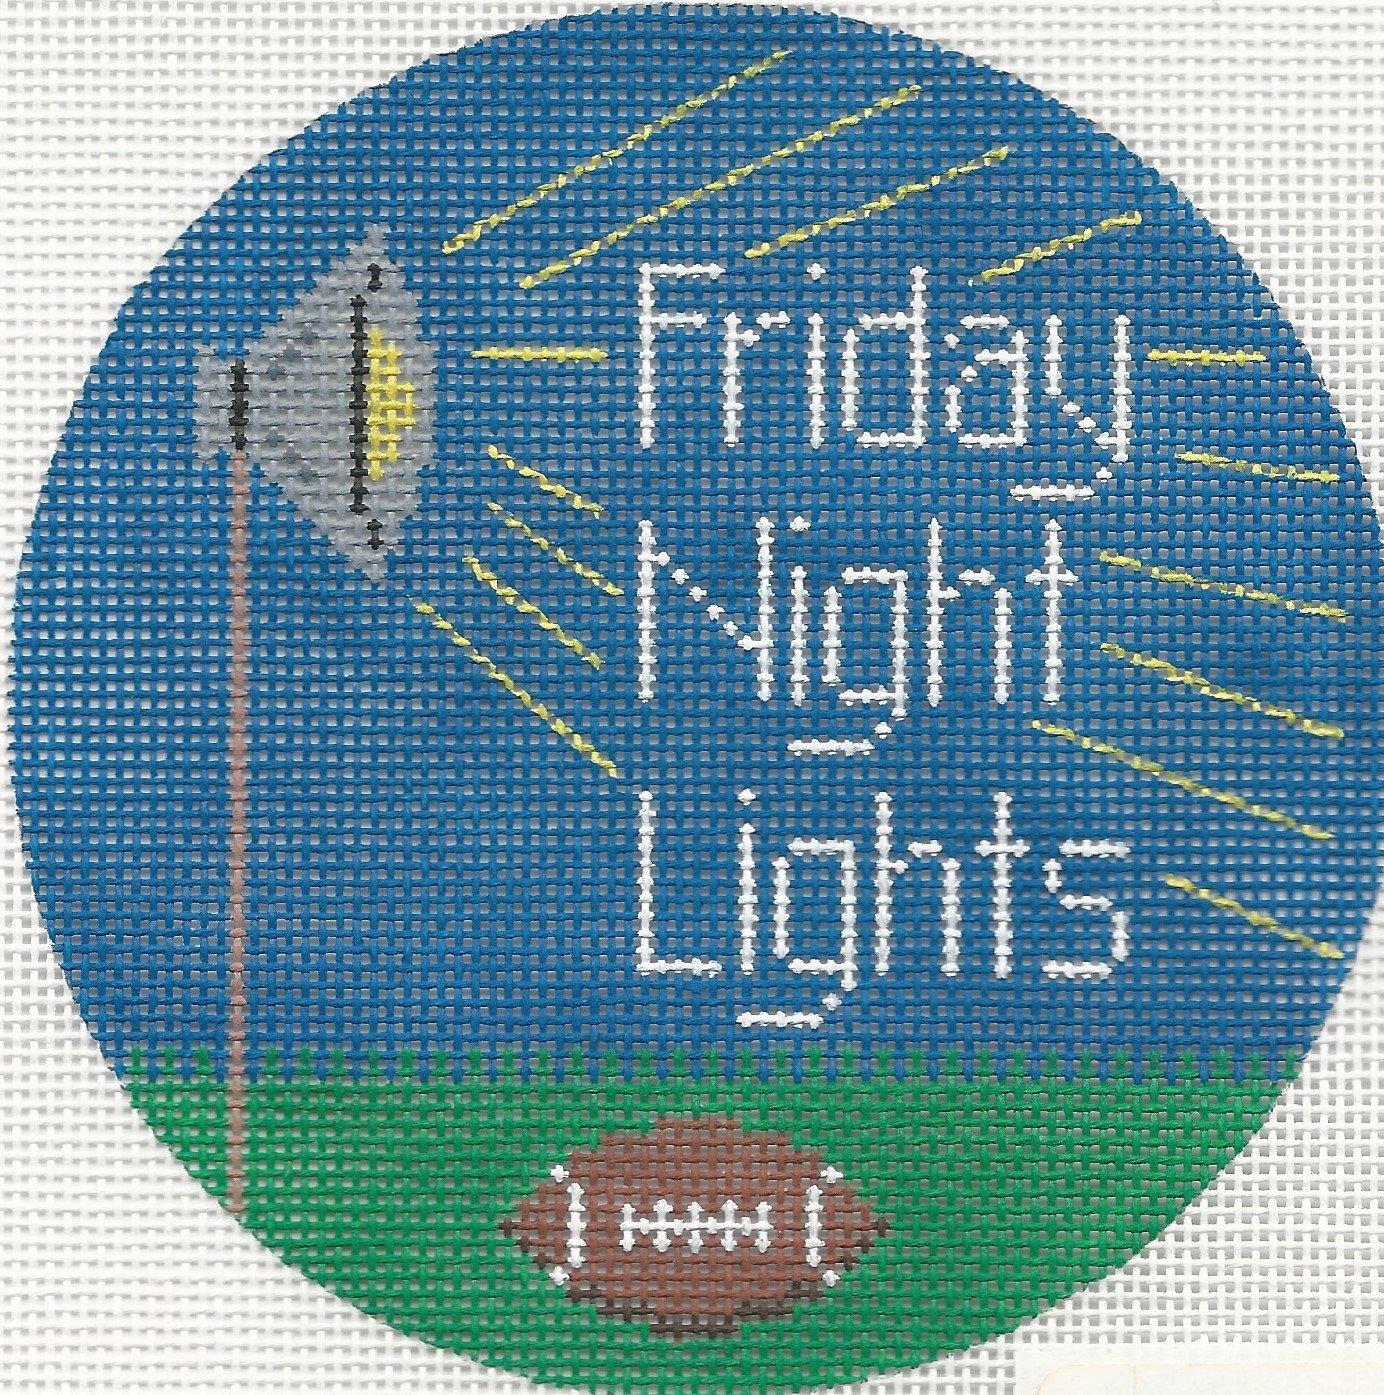 4212 - FRIDAY NIGHT LIGHTS